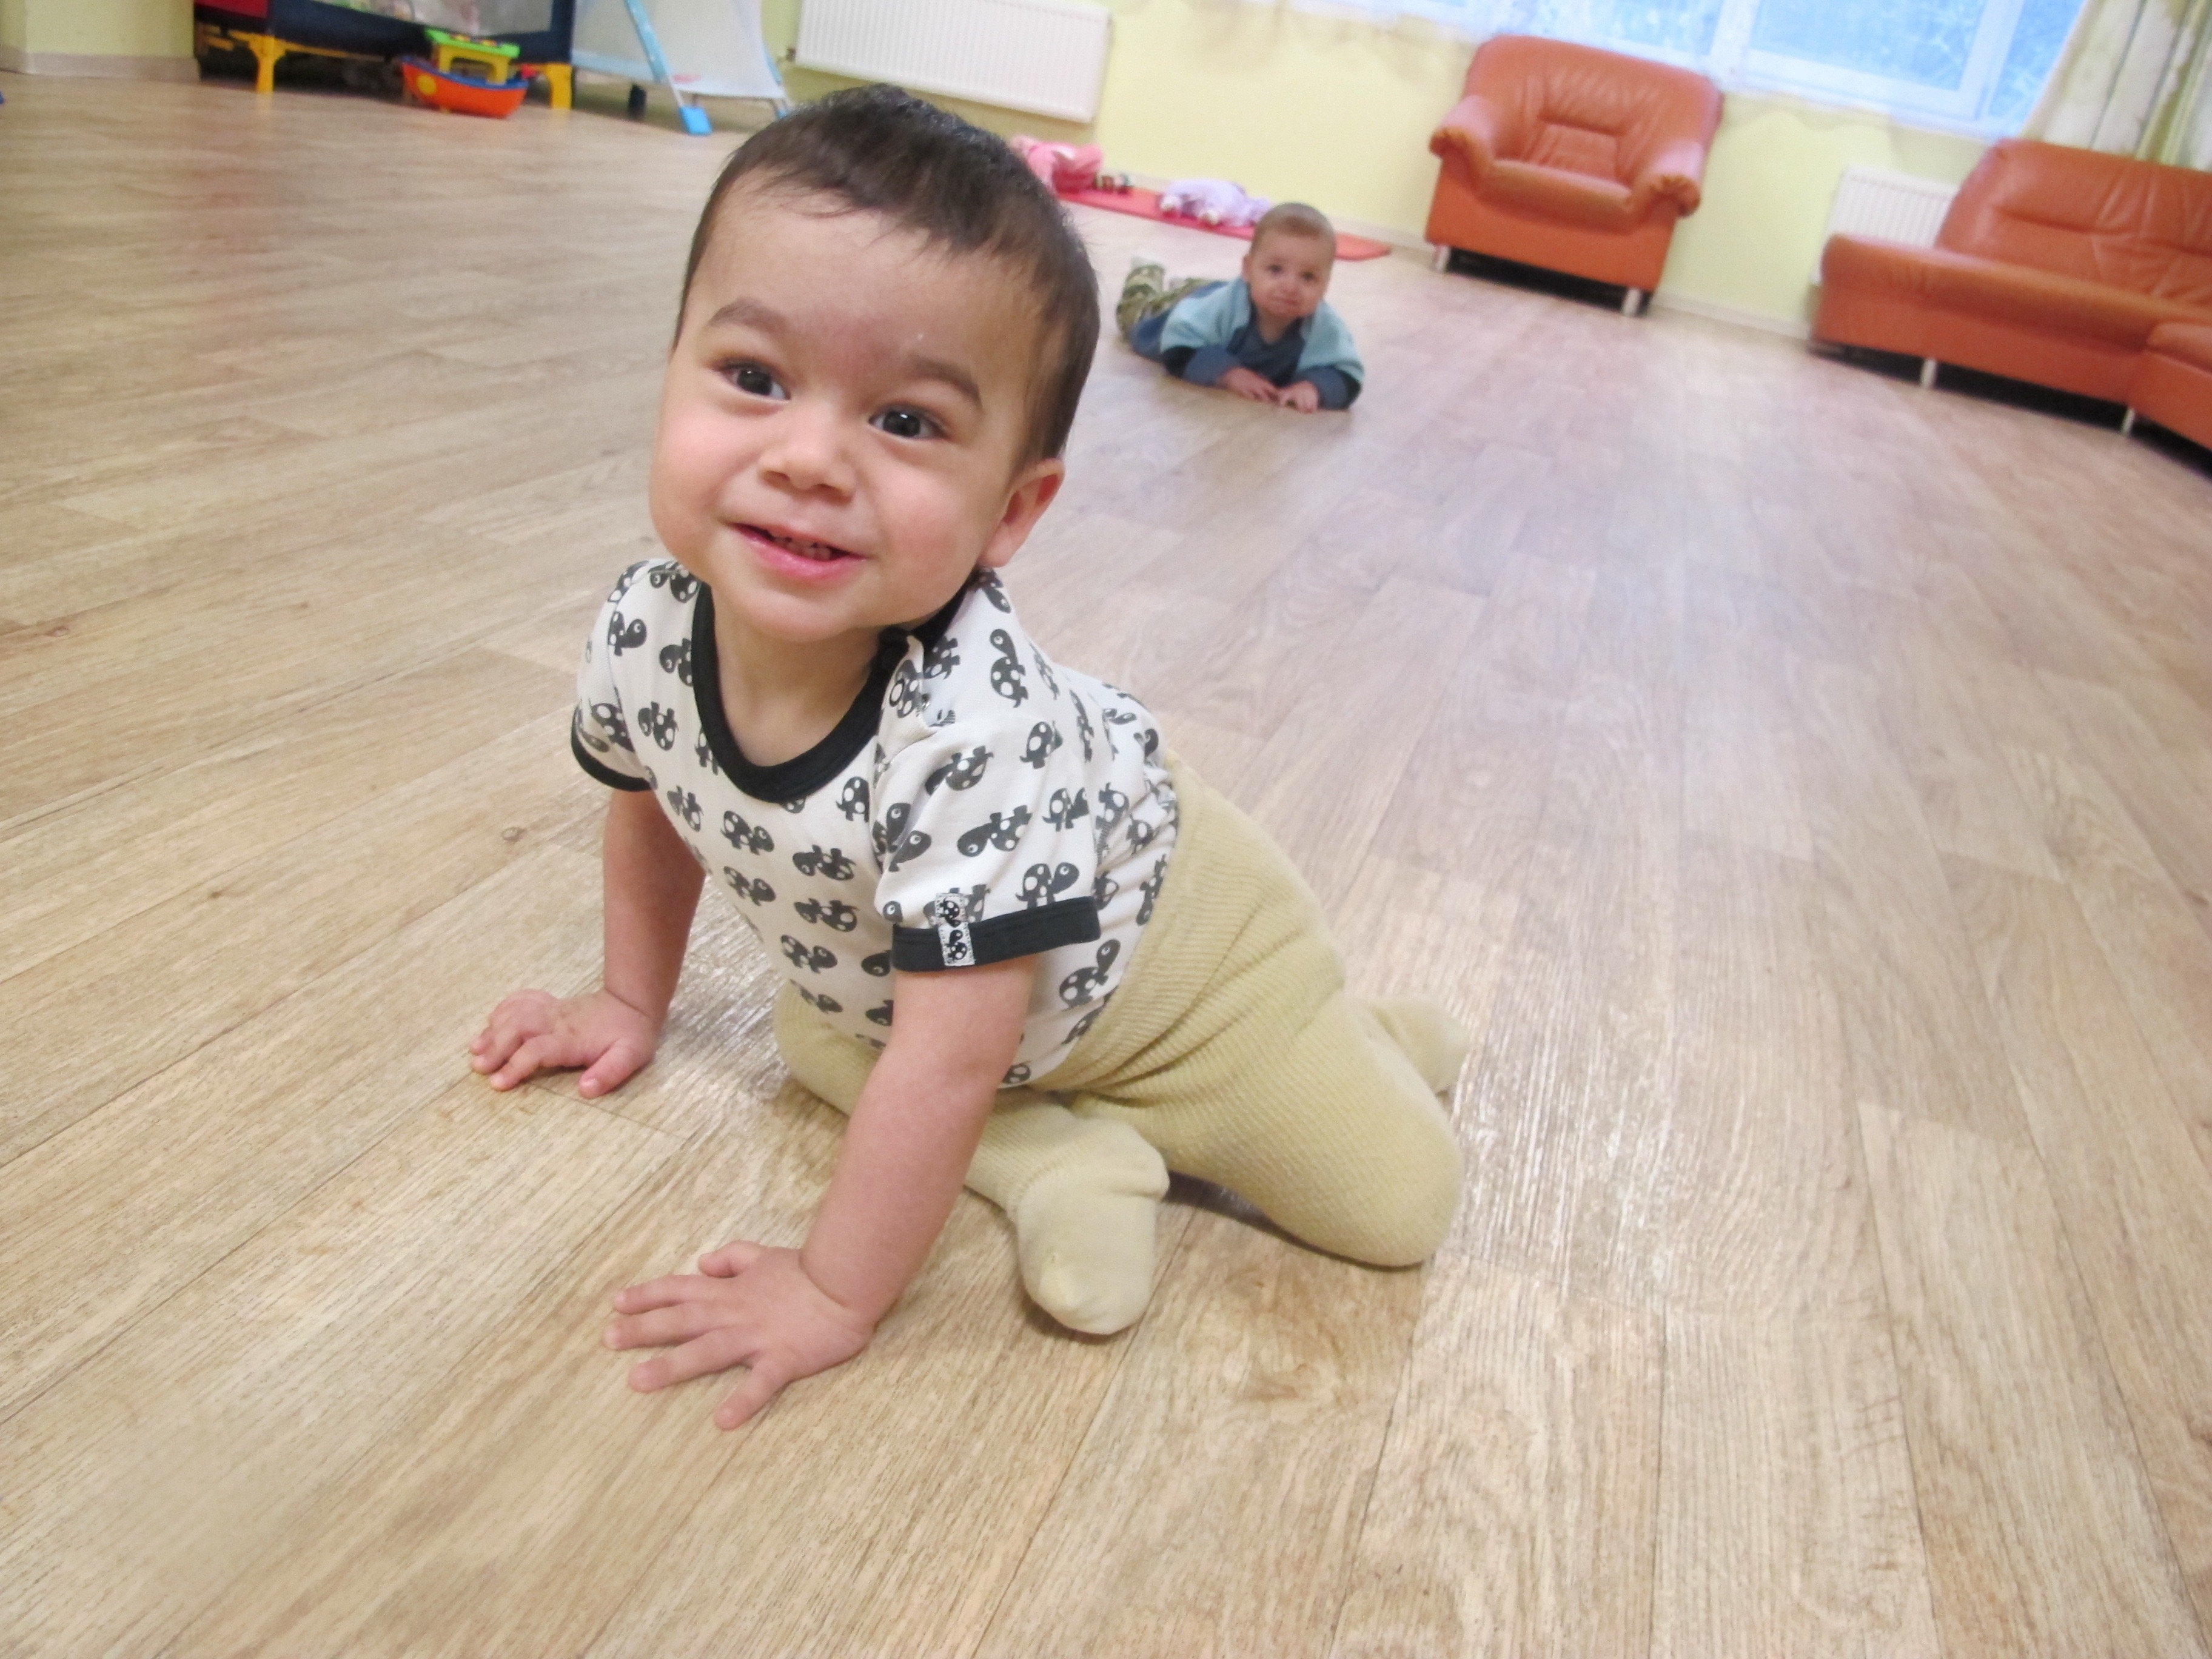 Latvia, orphanage, special needs, adoption, orphan